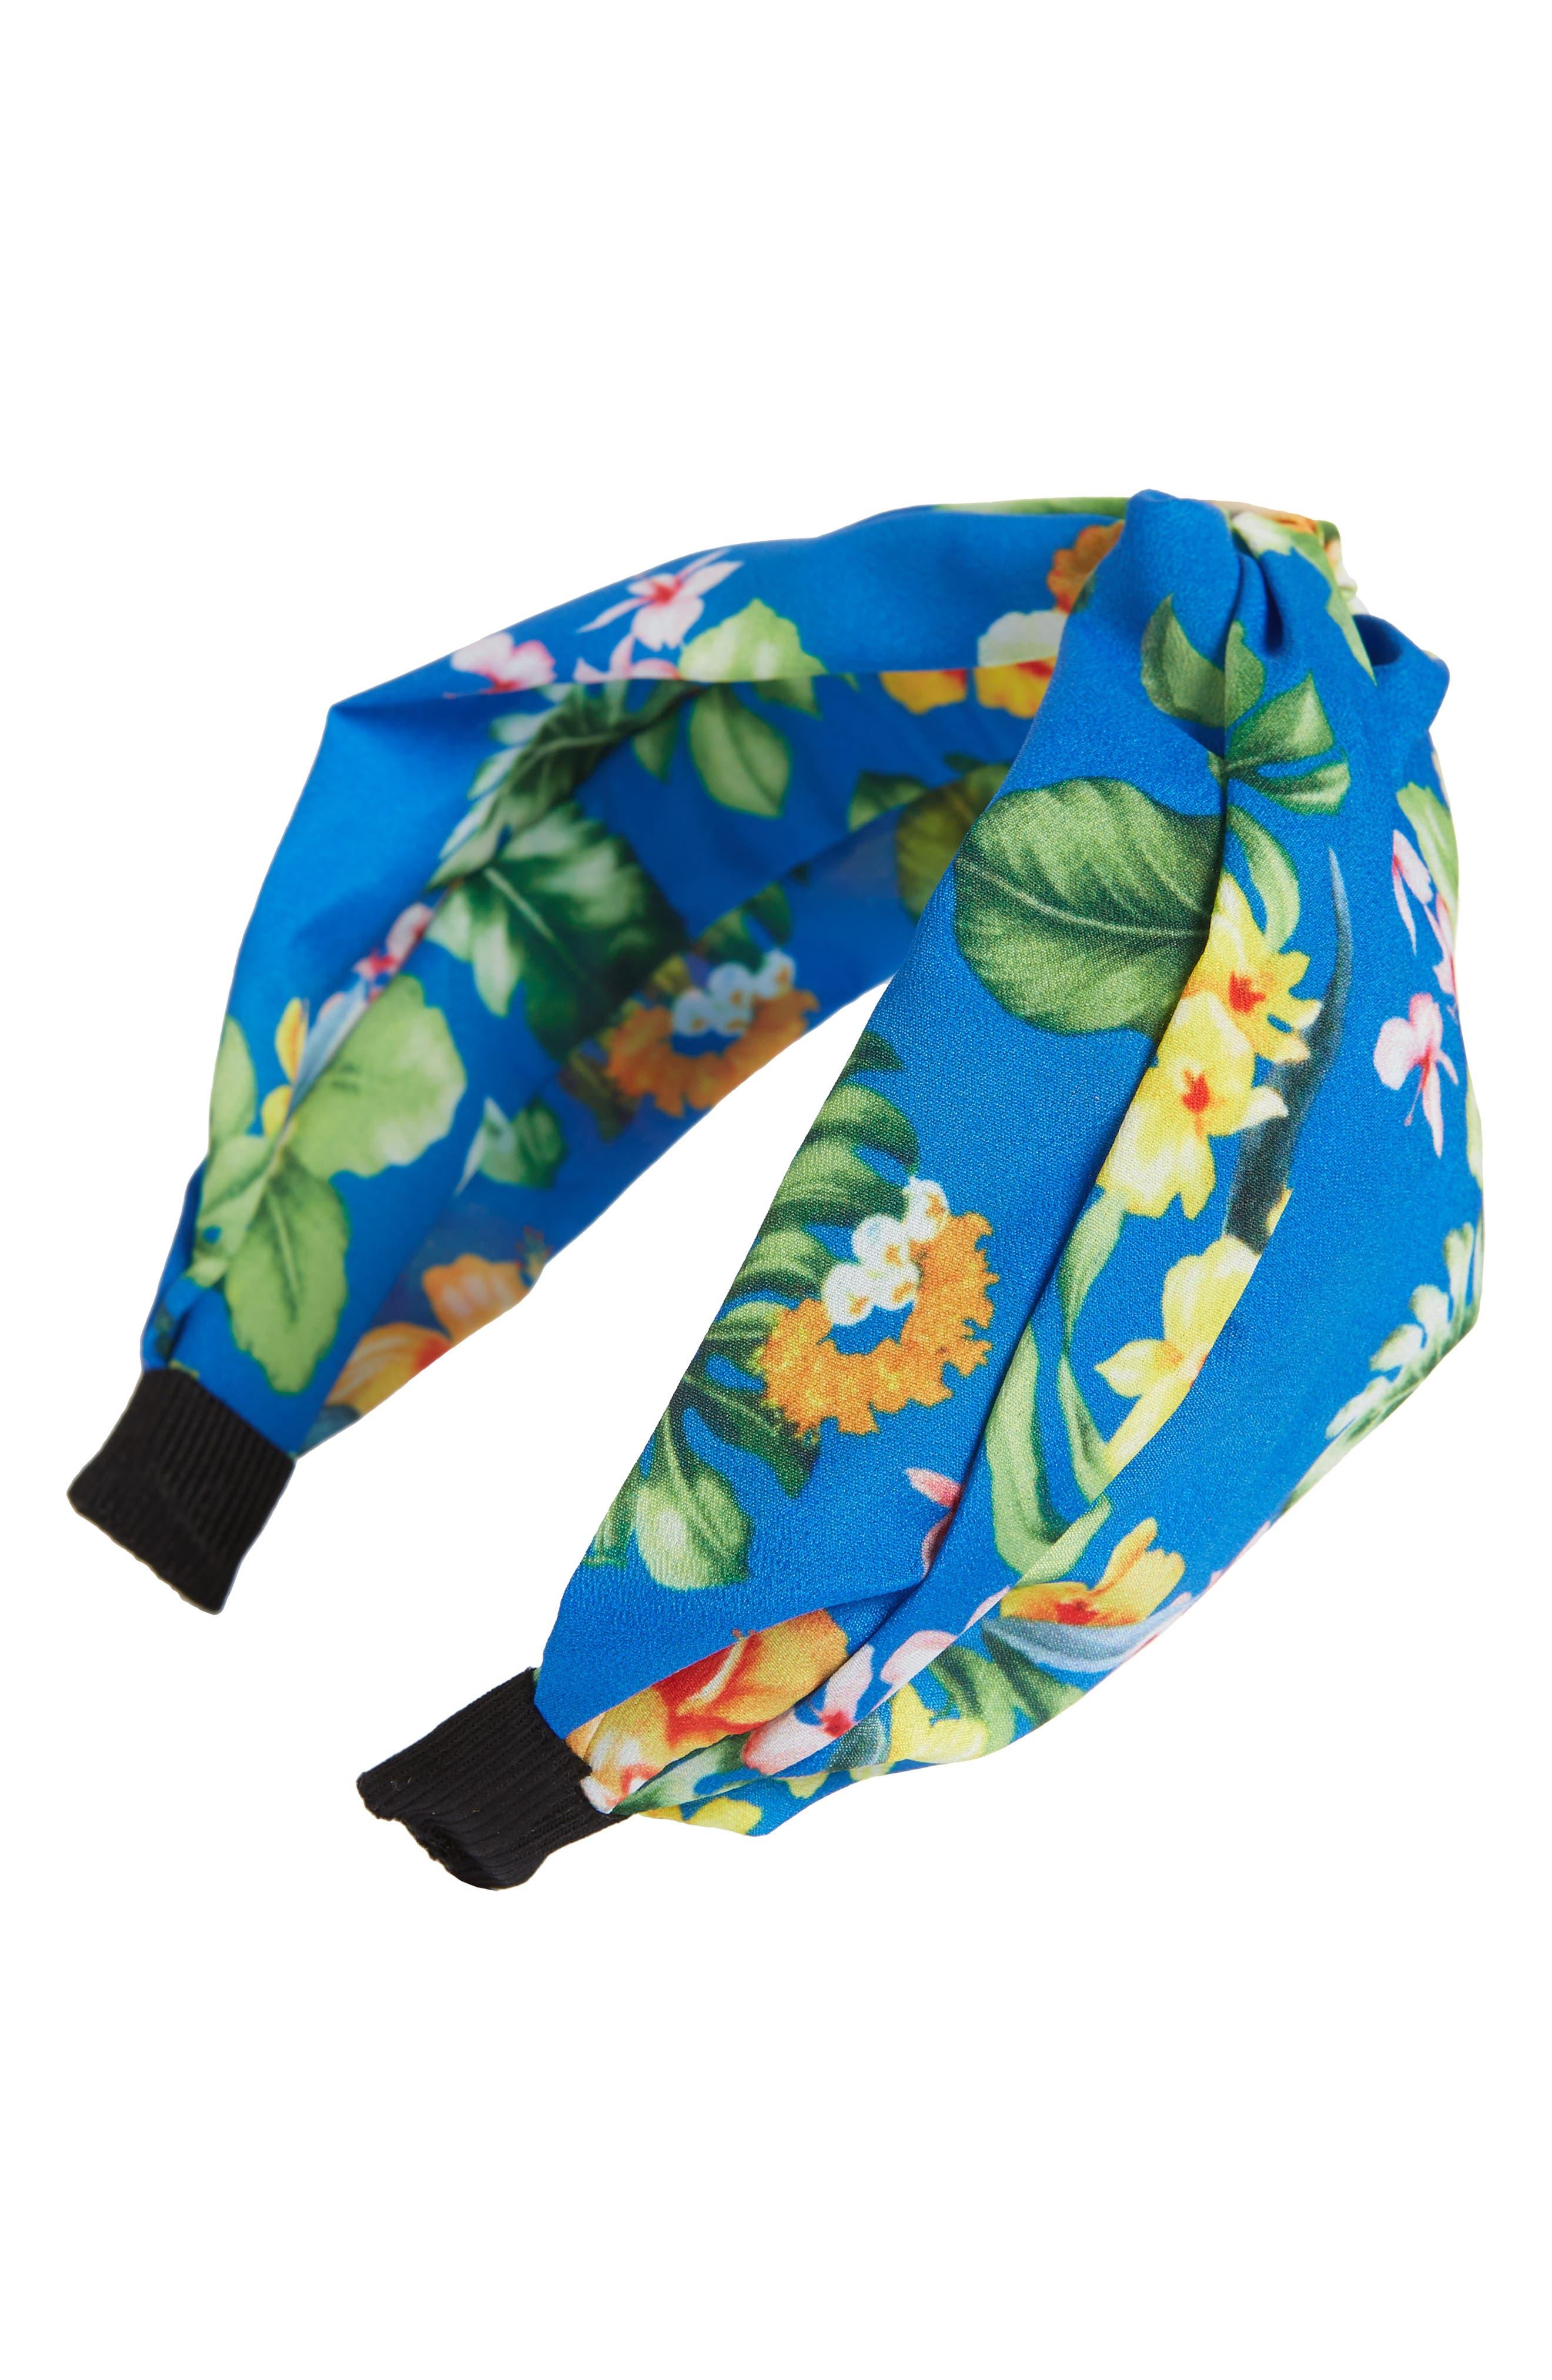 Floral Print Headband,                         Main,                         color, Navy